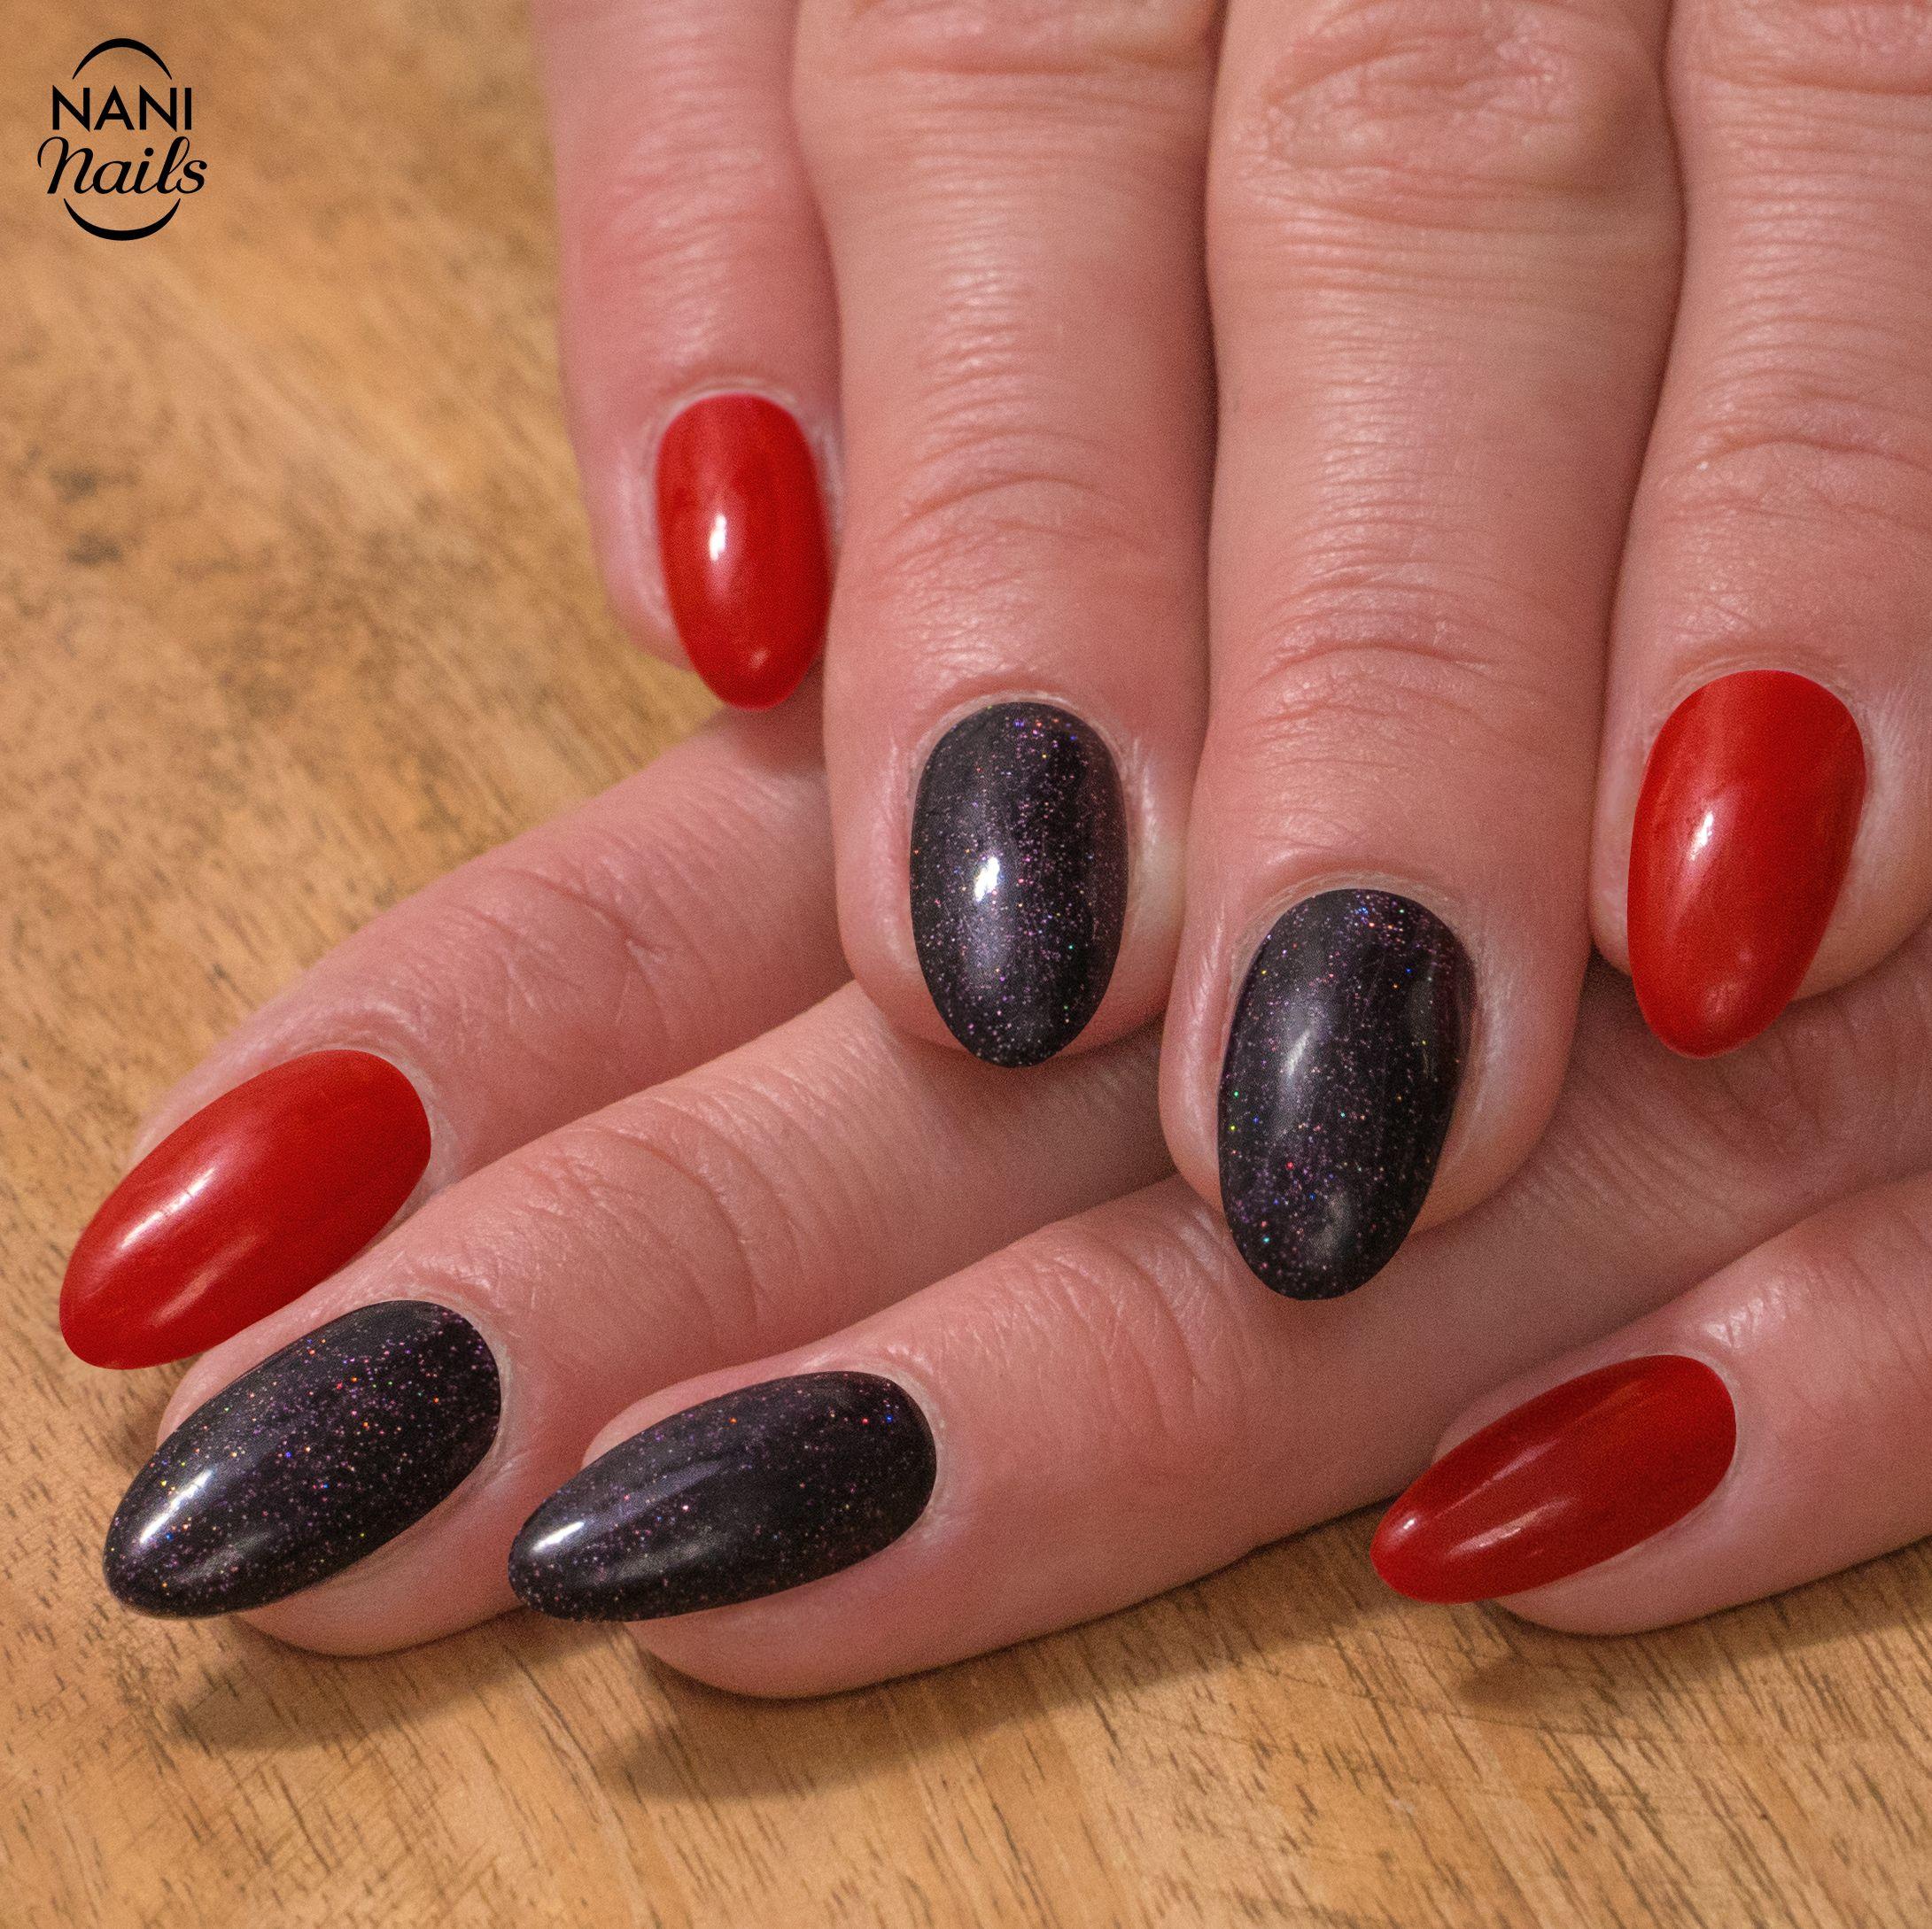 Az Prekvapive Elegantni Kombinaci Tvori Klasicka Cervena A Fialova S Jemnymi Trpytkami Co Na Tuto Manikuru Rikate Nails Manicure Naninails Nailart In 2020 With Images Nail Art